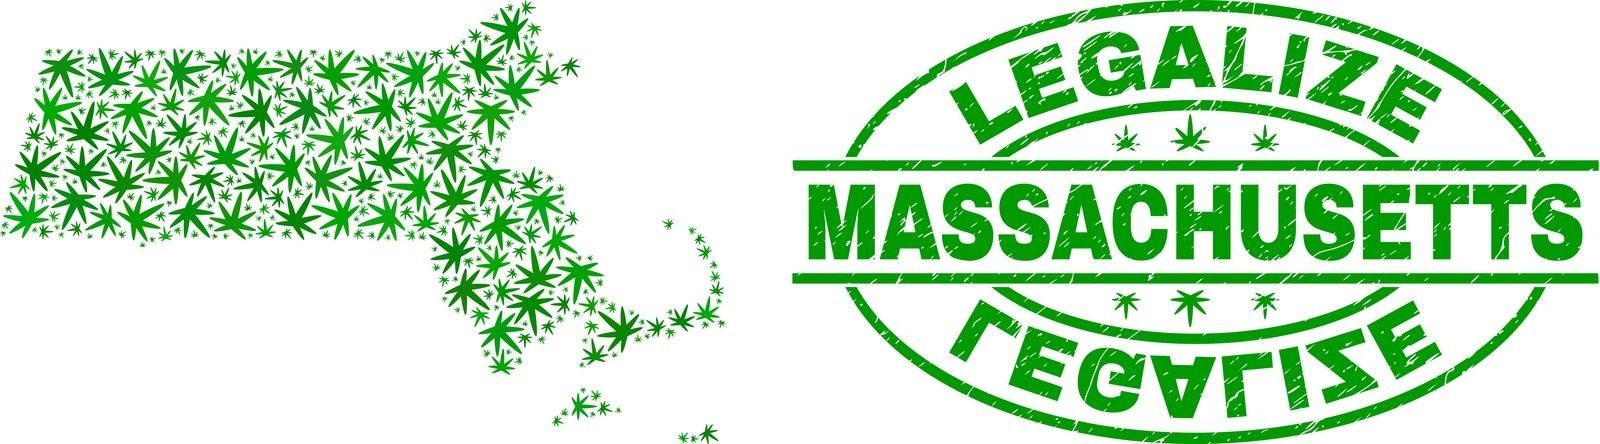 Boston marijuana news